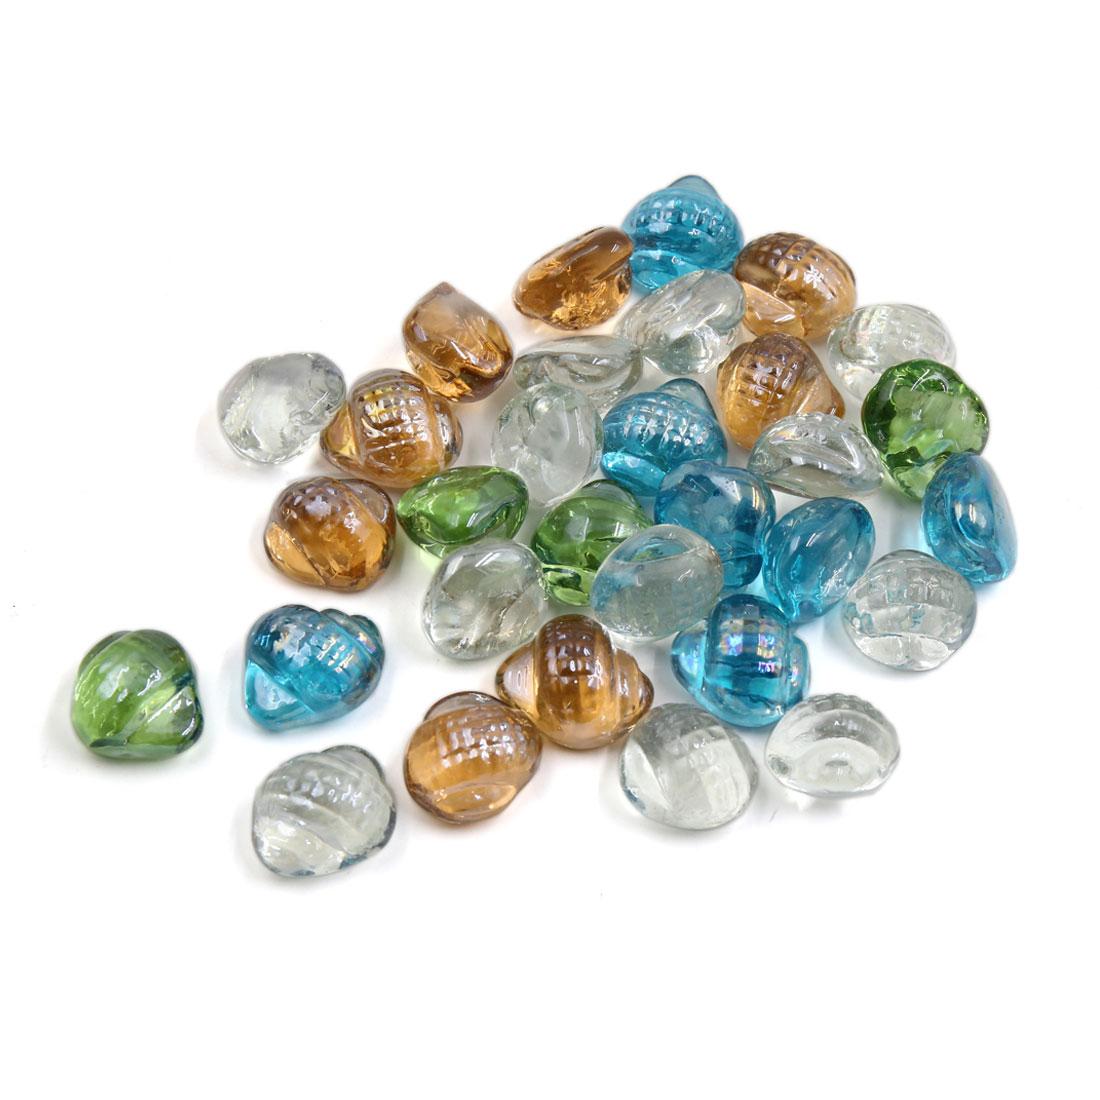 500g Multicolor Glass Conch Shaped Fish Tank Aquarium Decor Pebble Bead Stones